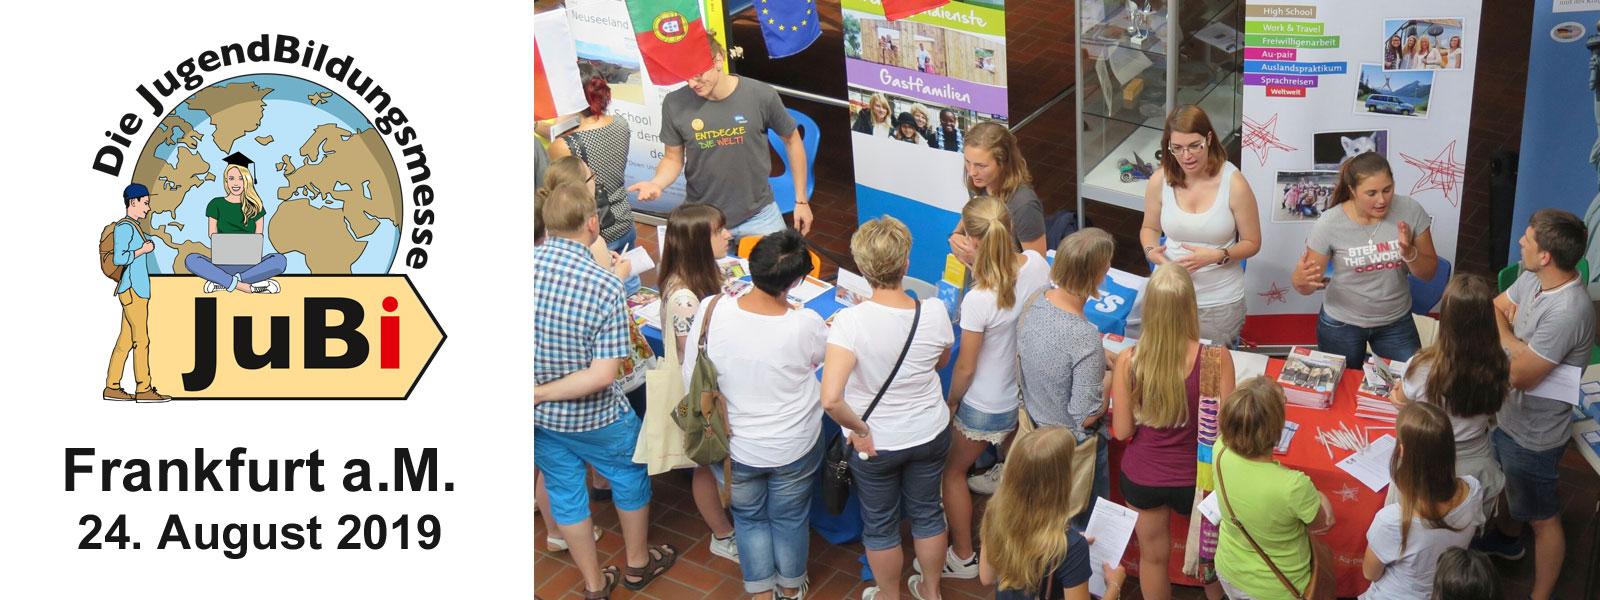 Jugendbildungsmesse Frankfurt